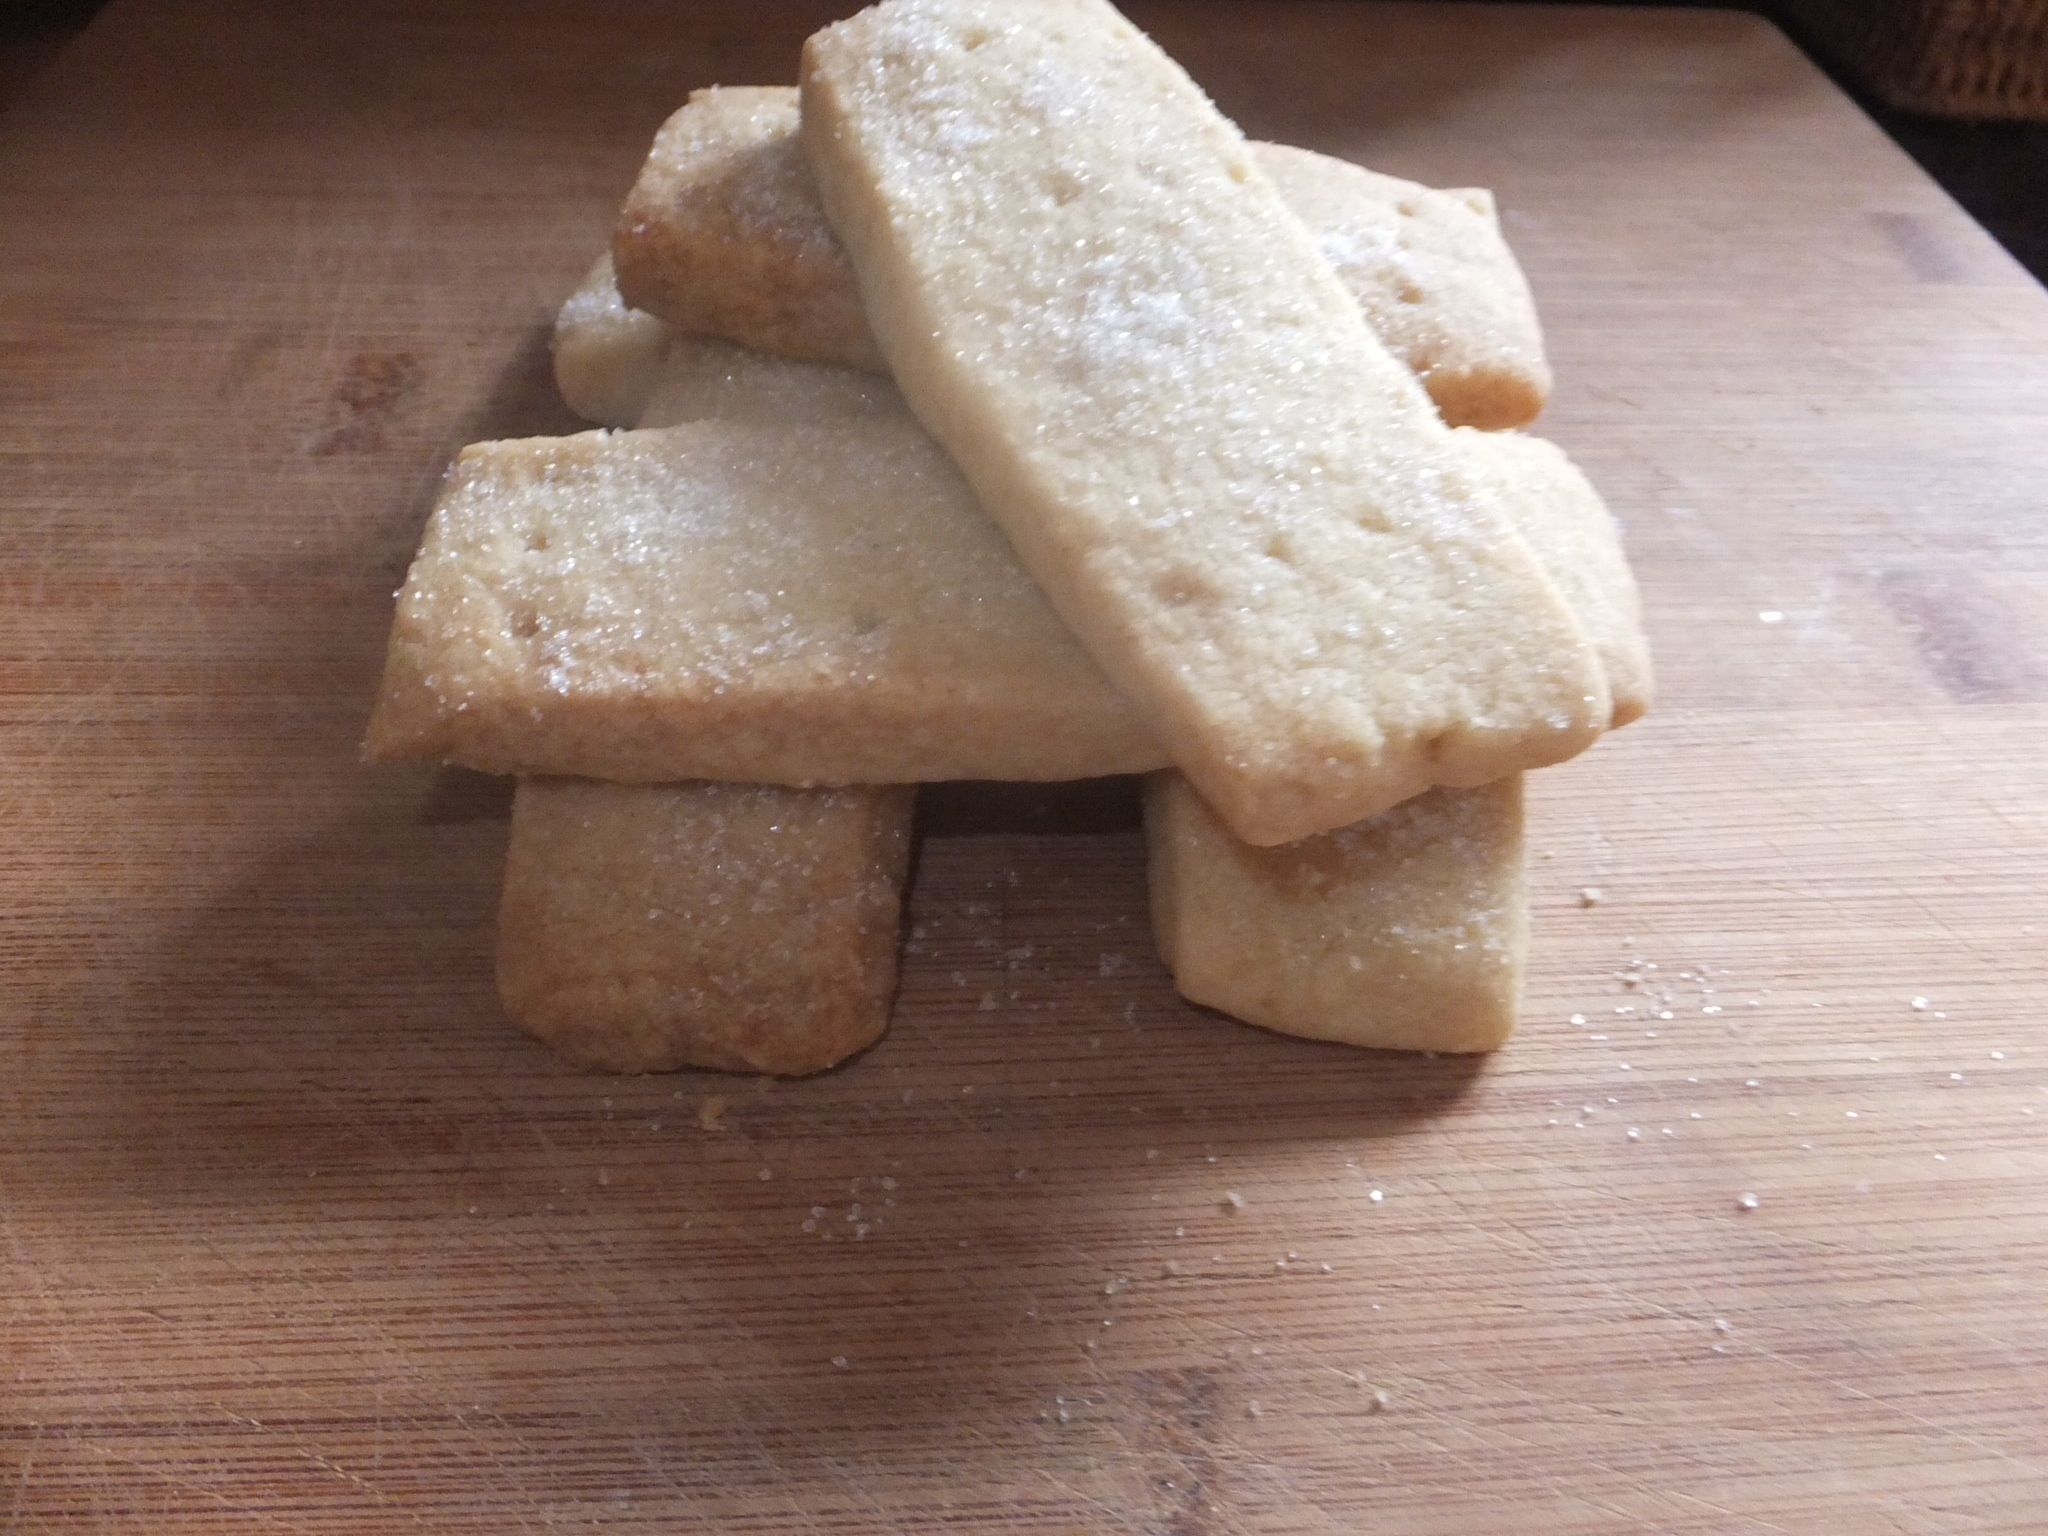 Homemade Christmas Gifts - Shortbread